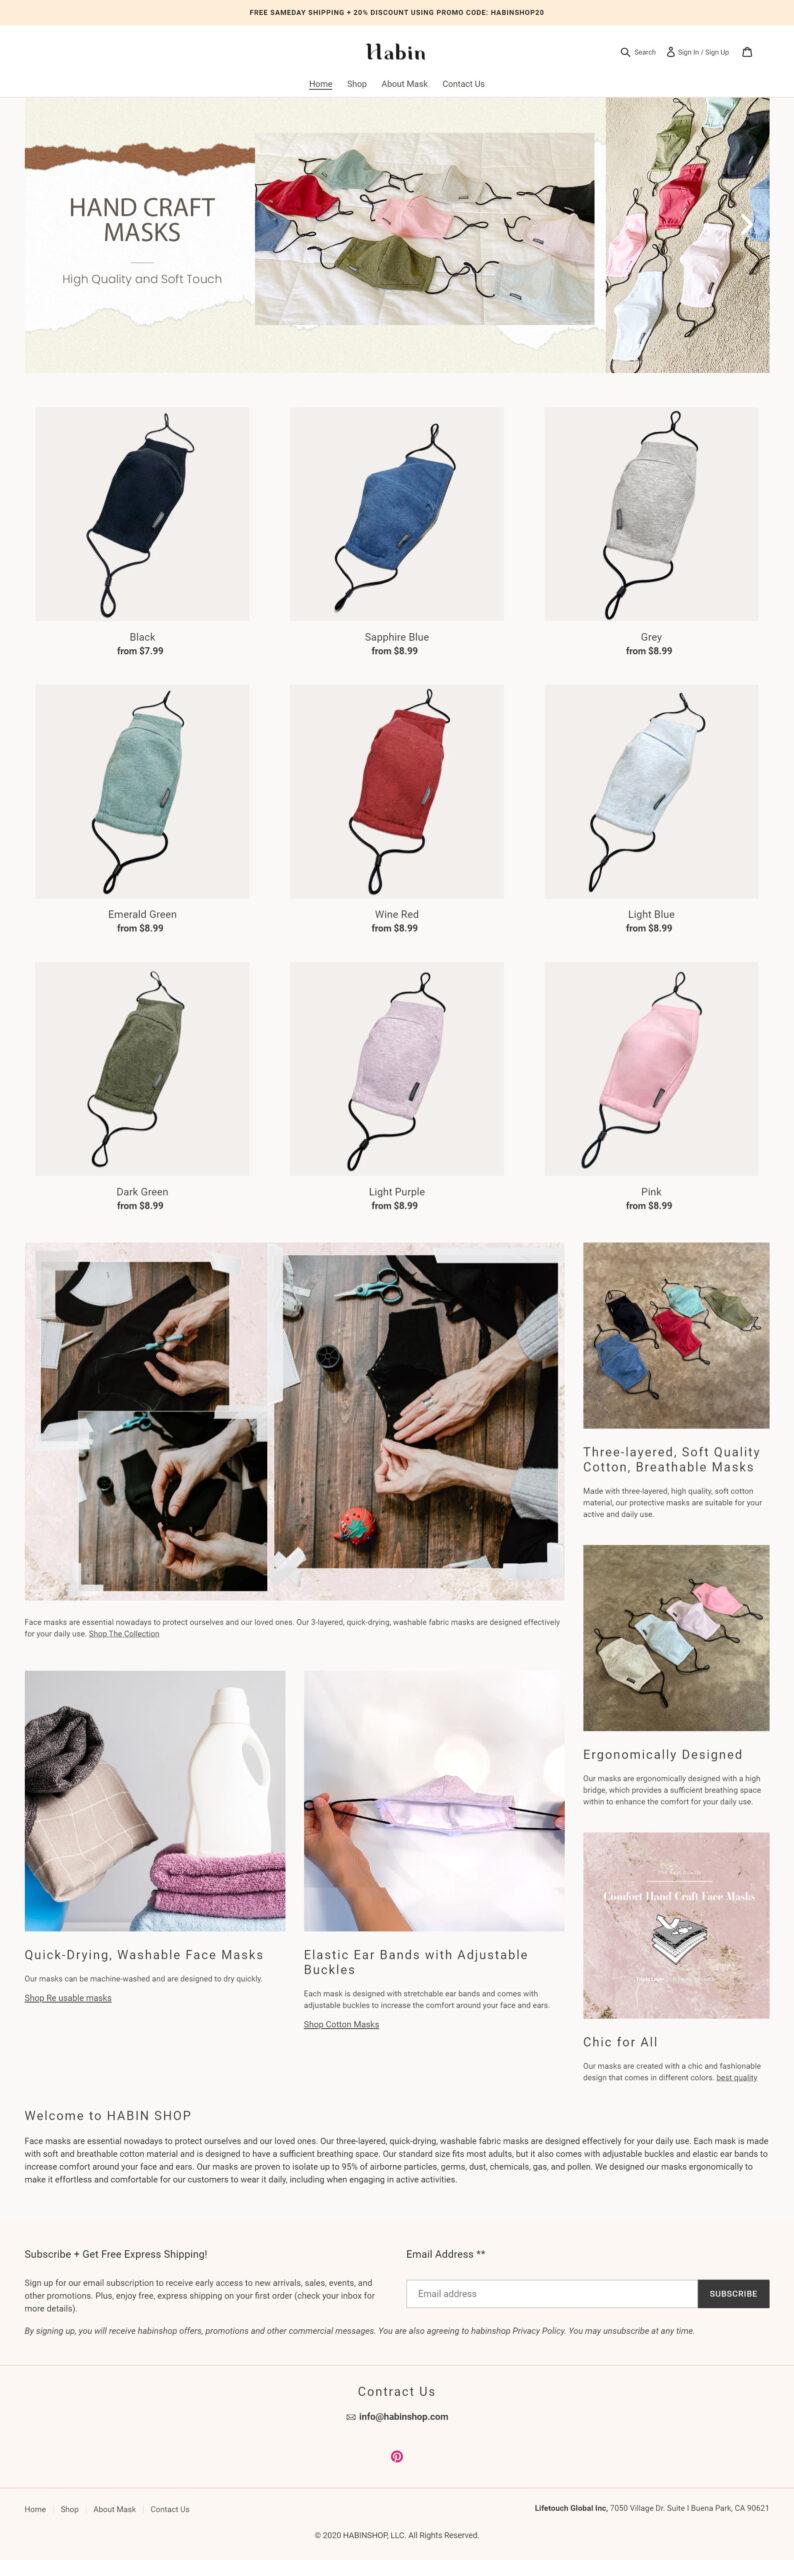 shopify-webdesign-global-글로발셀링-드랍쉬핑-mask-la-WEBAGENCY